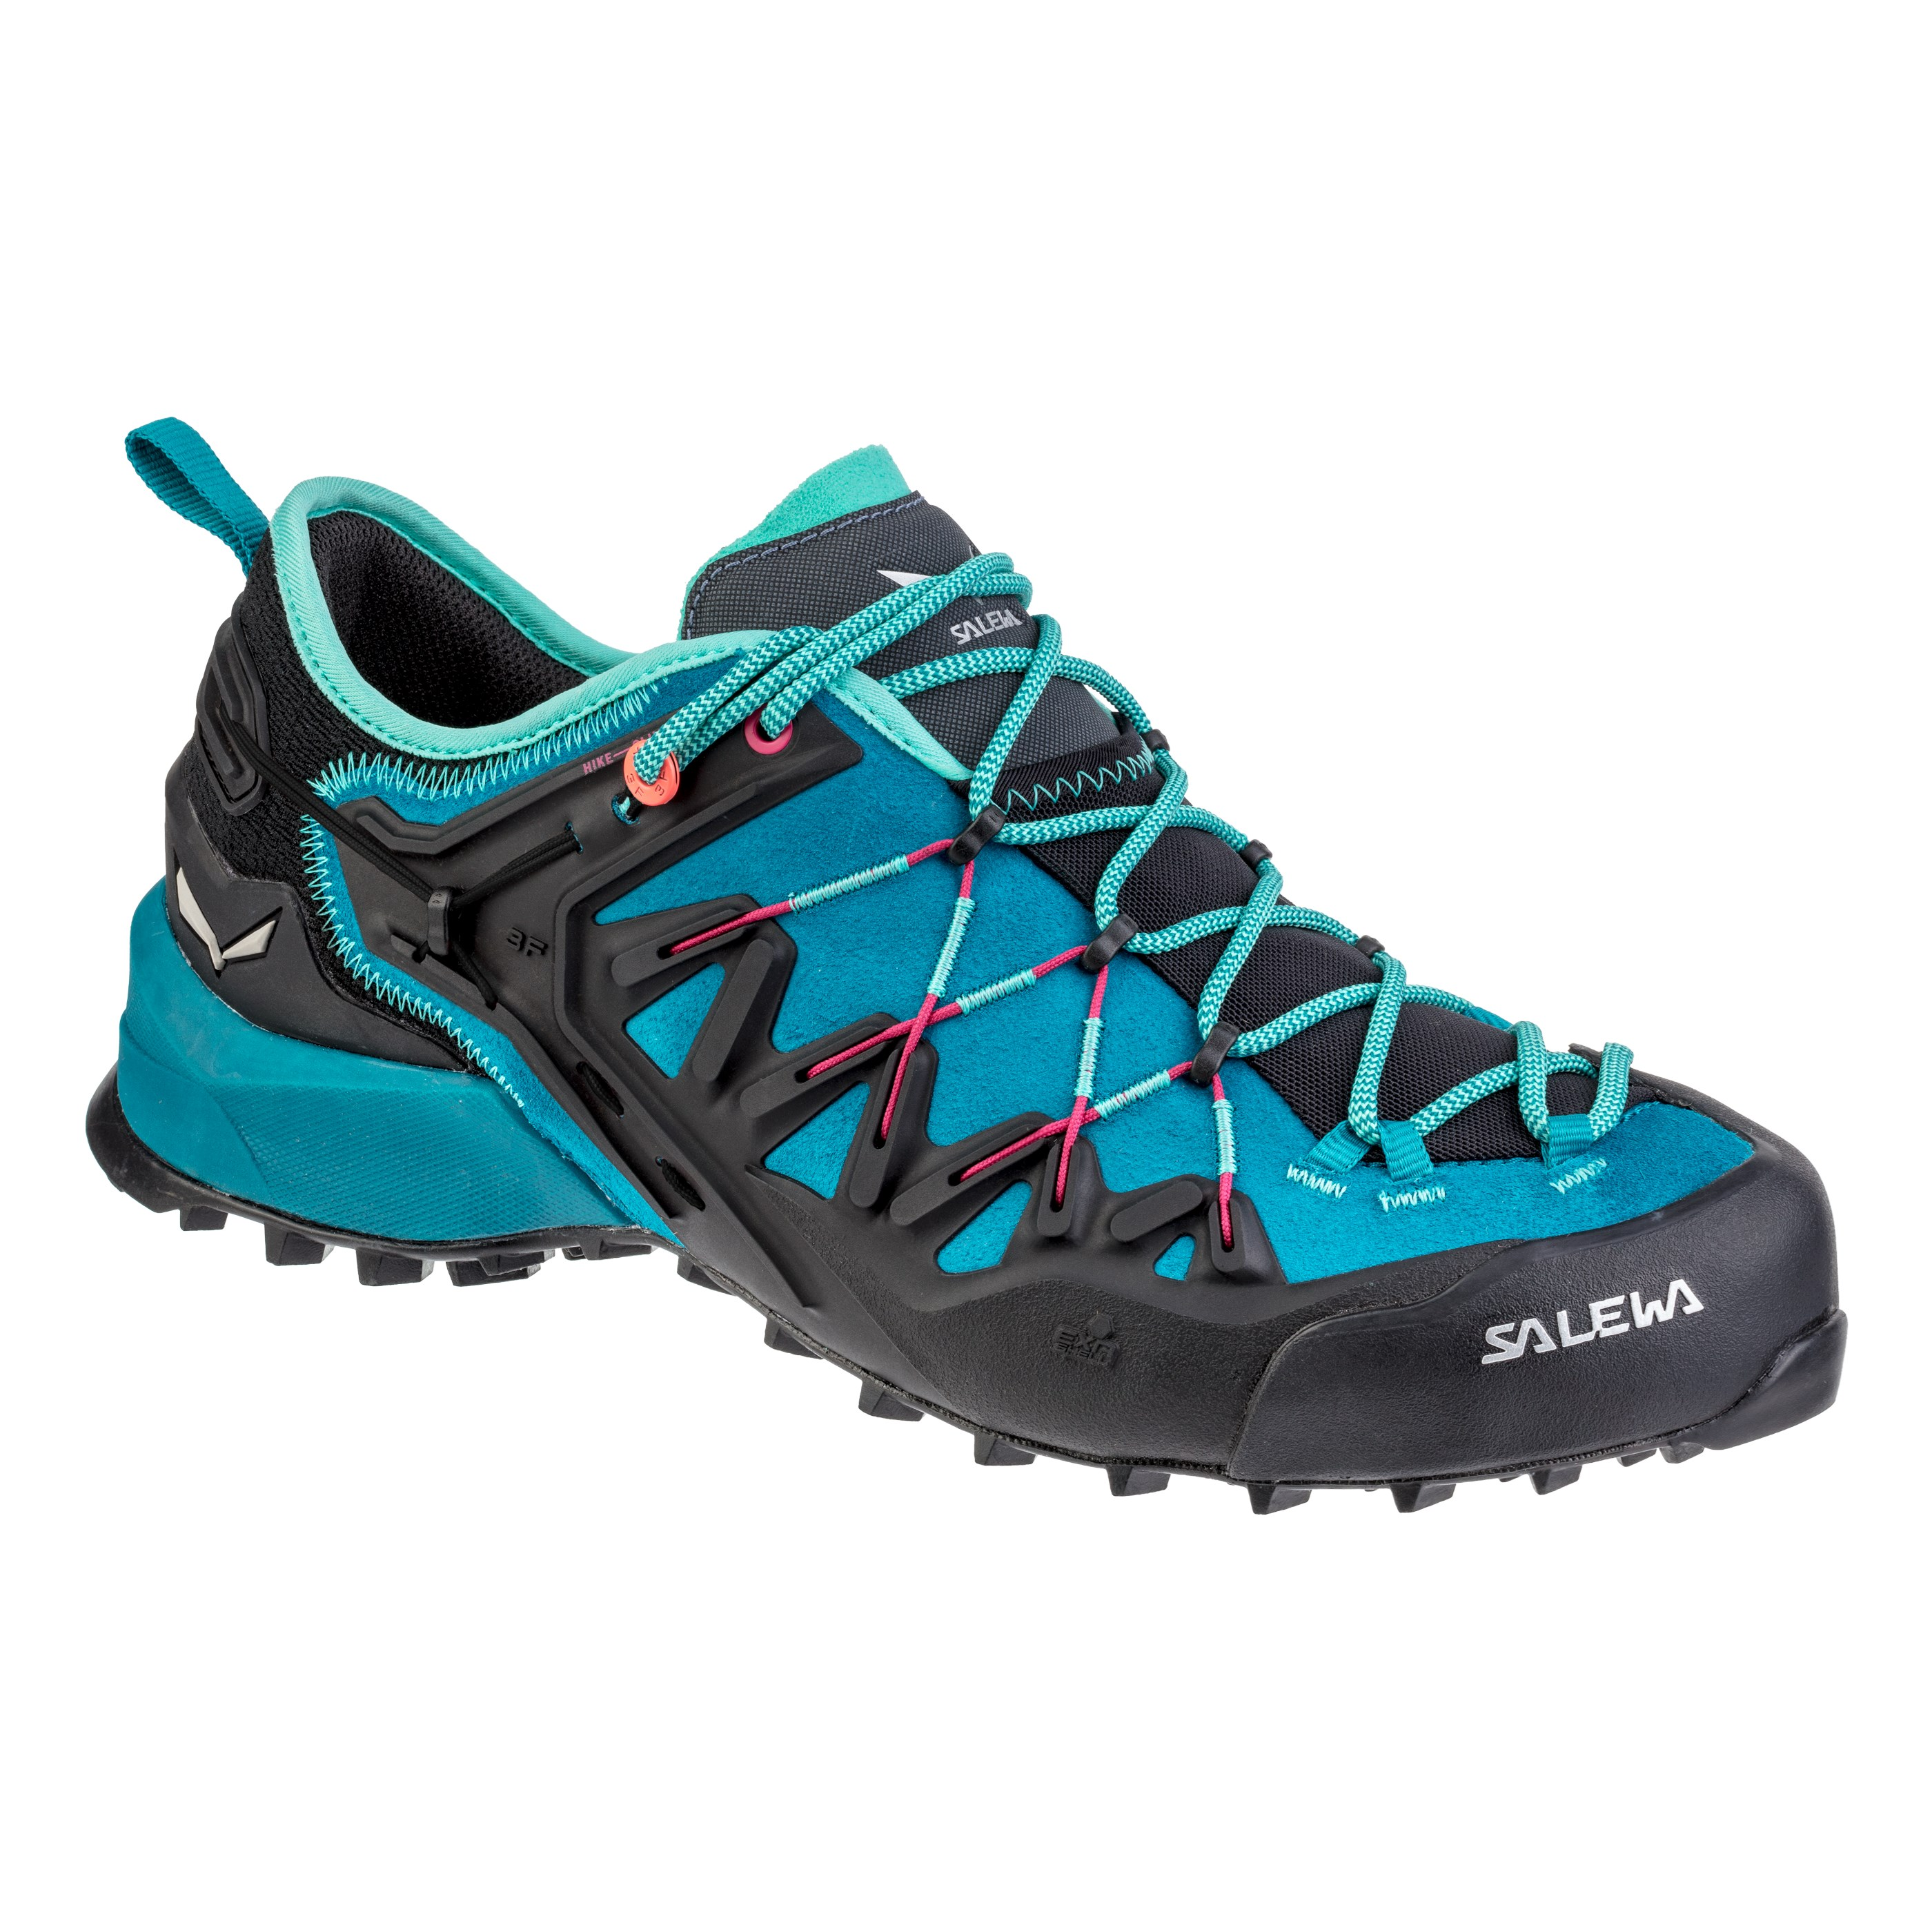 Dámske turistické topánky SALEWA WS WILDFIRE E  c778c1d009b